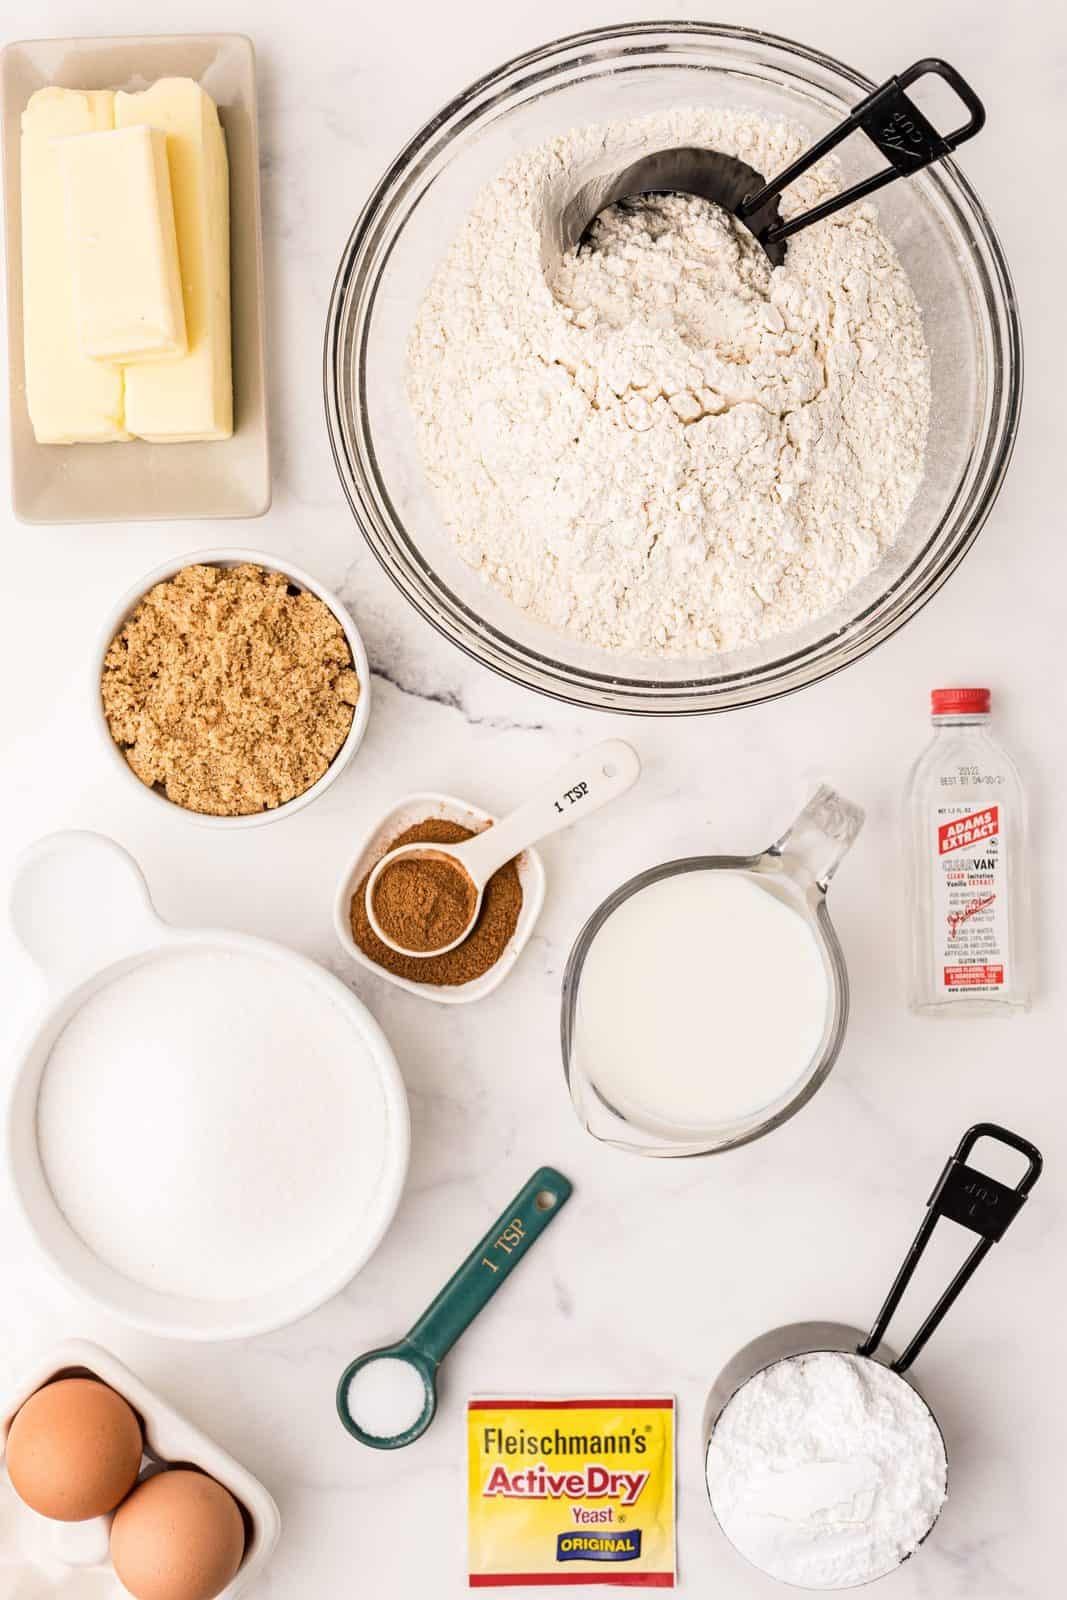 Ingredients needed: whole milk, active dry yeast, granulated sugar, eggs, butter, salt, bread flour, cinnamon, brown sugar, vanilla and powdered sugar.